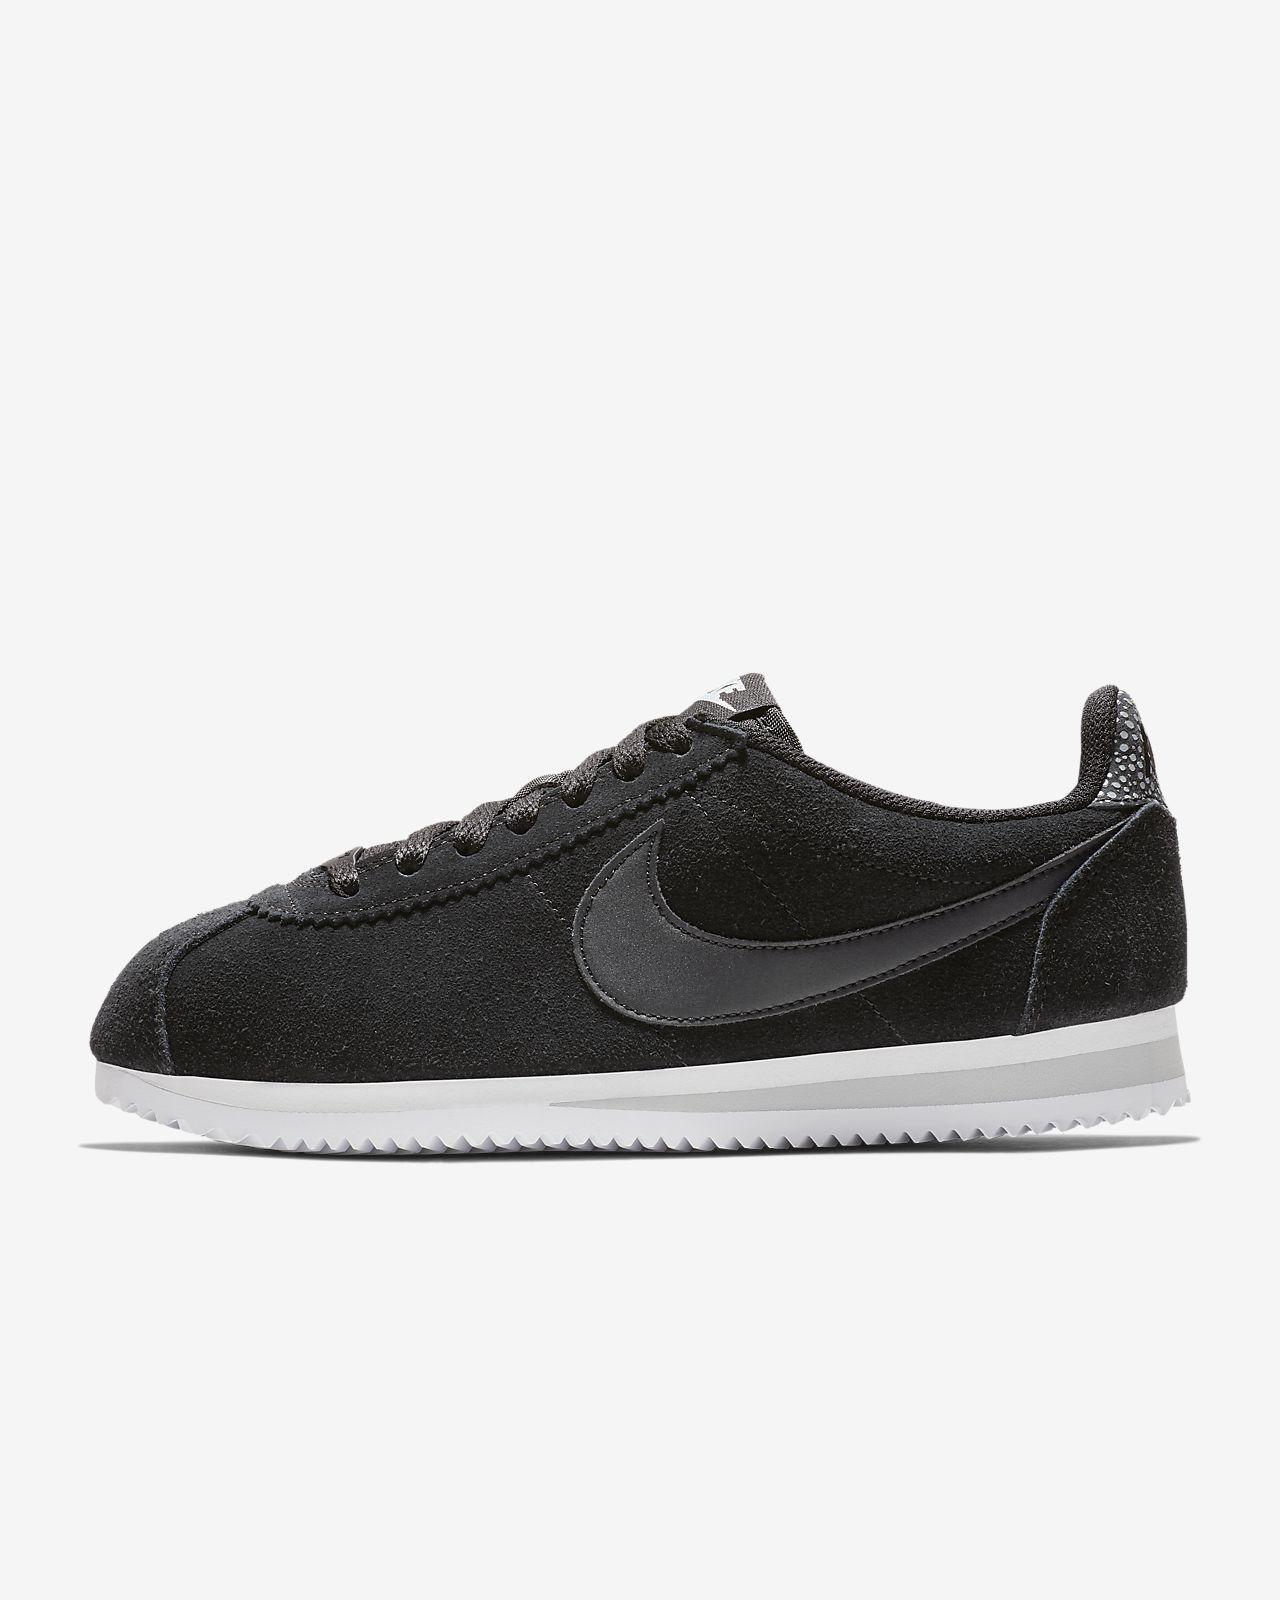 96ace8f3839f25 Nike Classic Cortez Premium Women s Shoe. Nike.com VN